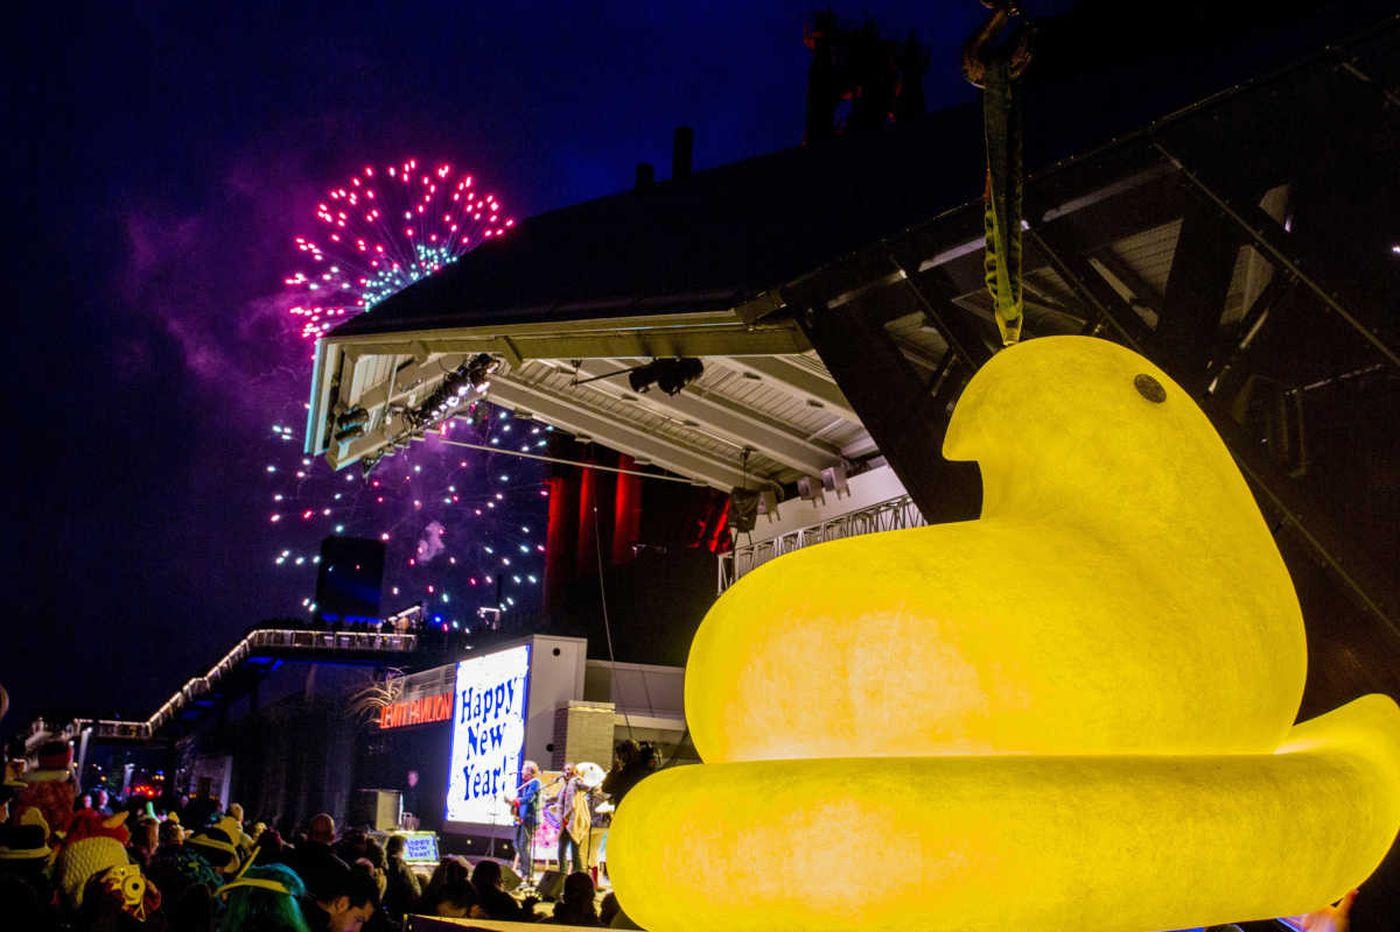 17 non-New Year's events in Philadelphia, Dec. 30-Jan. 1